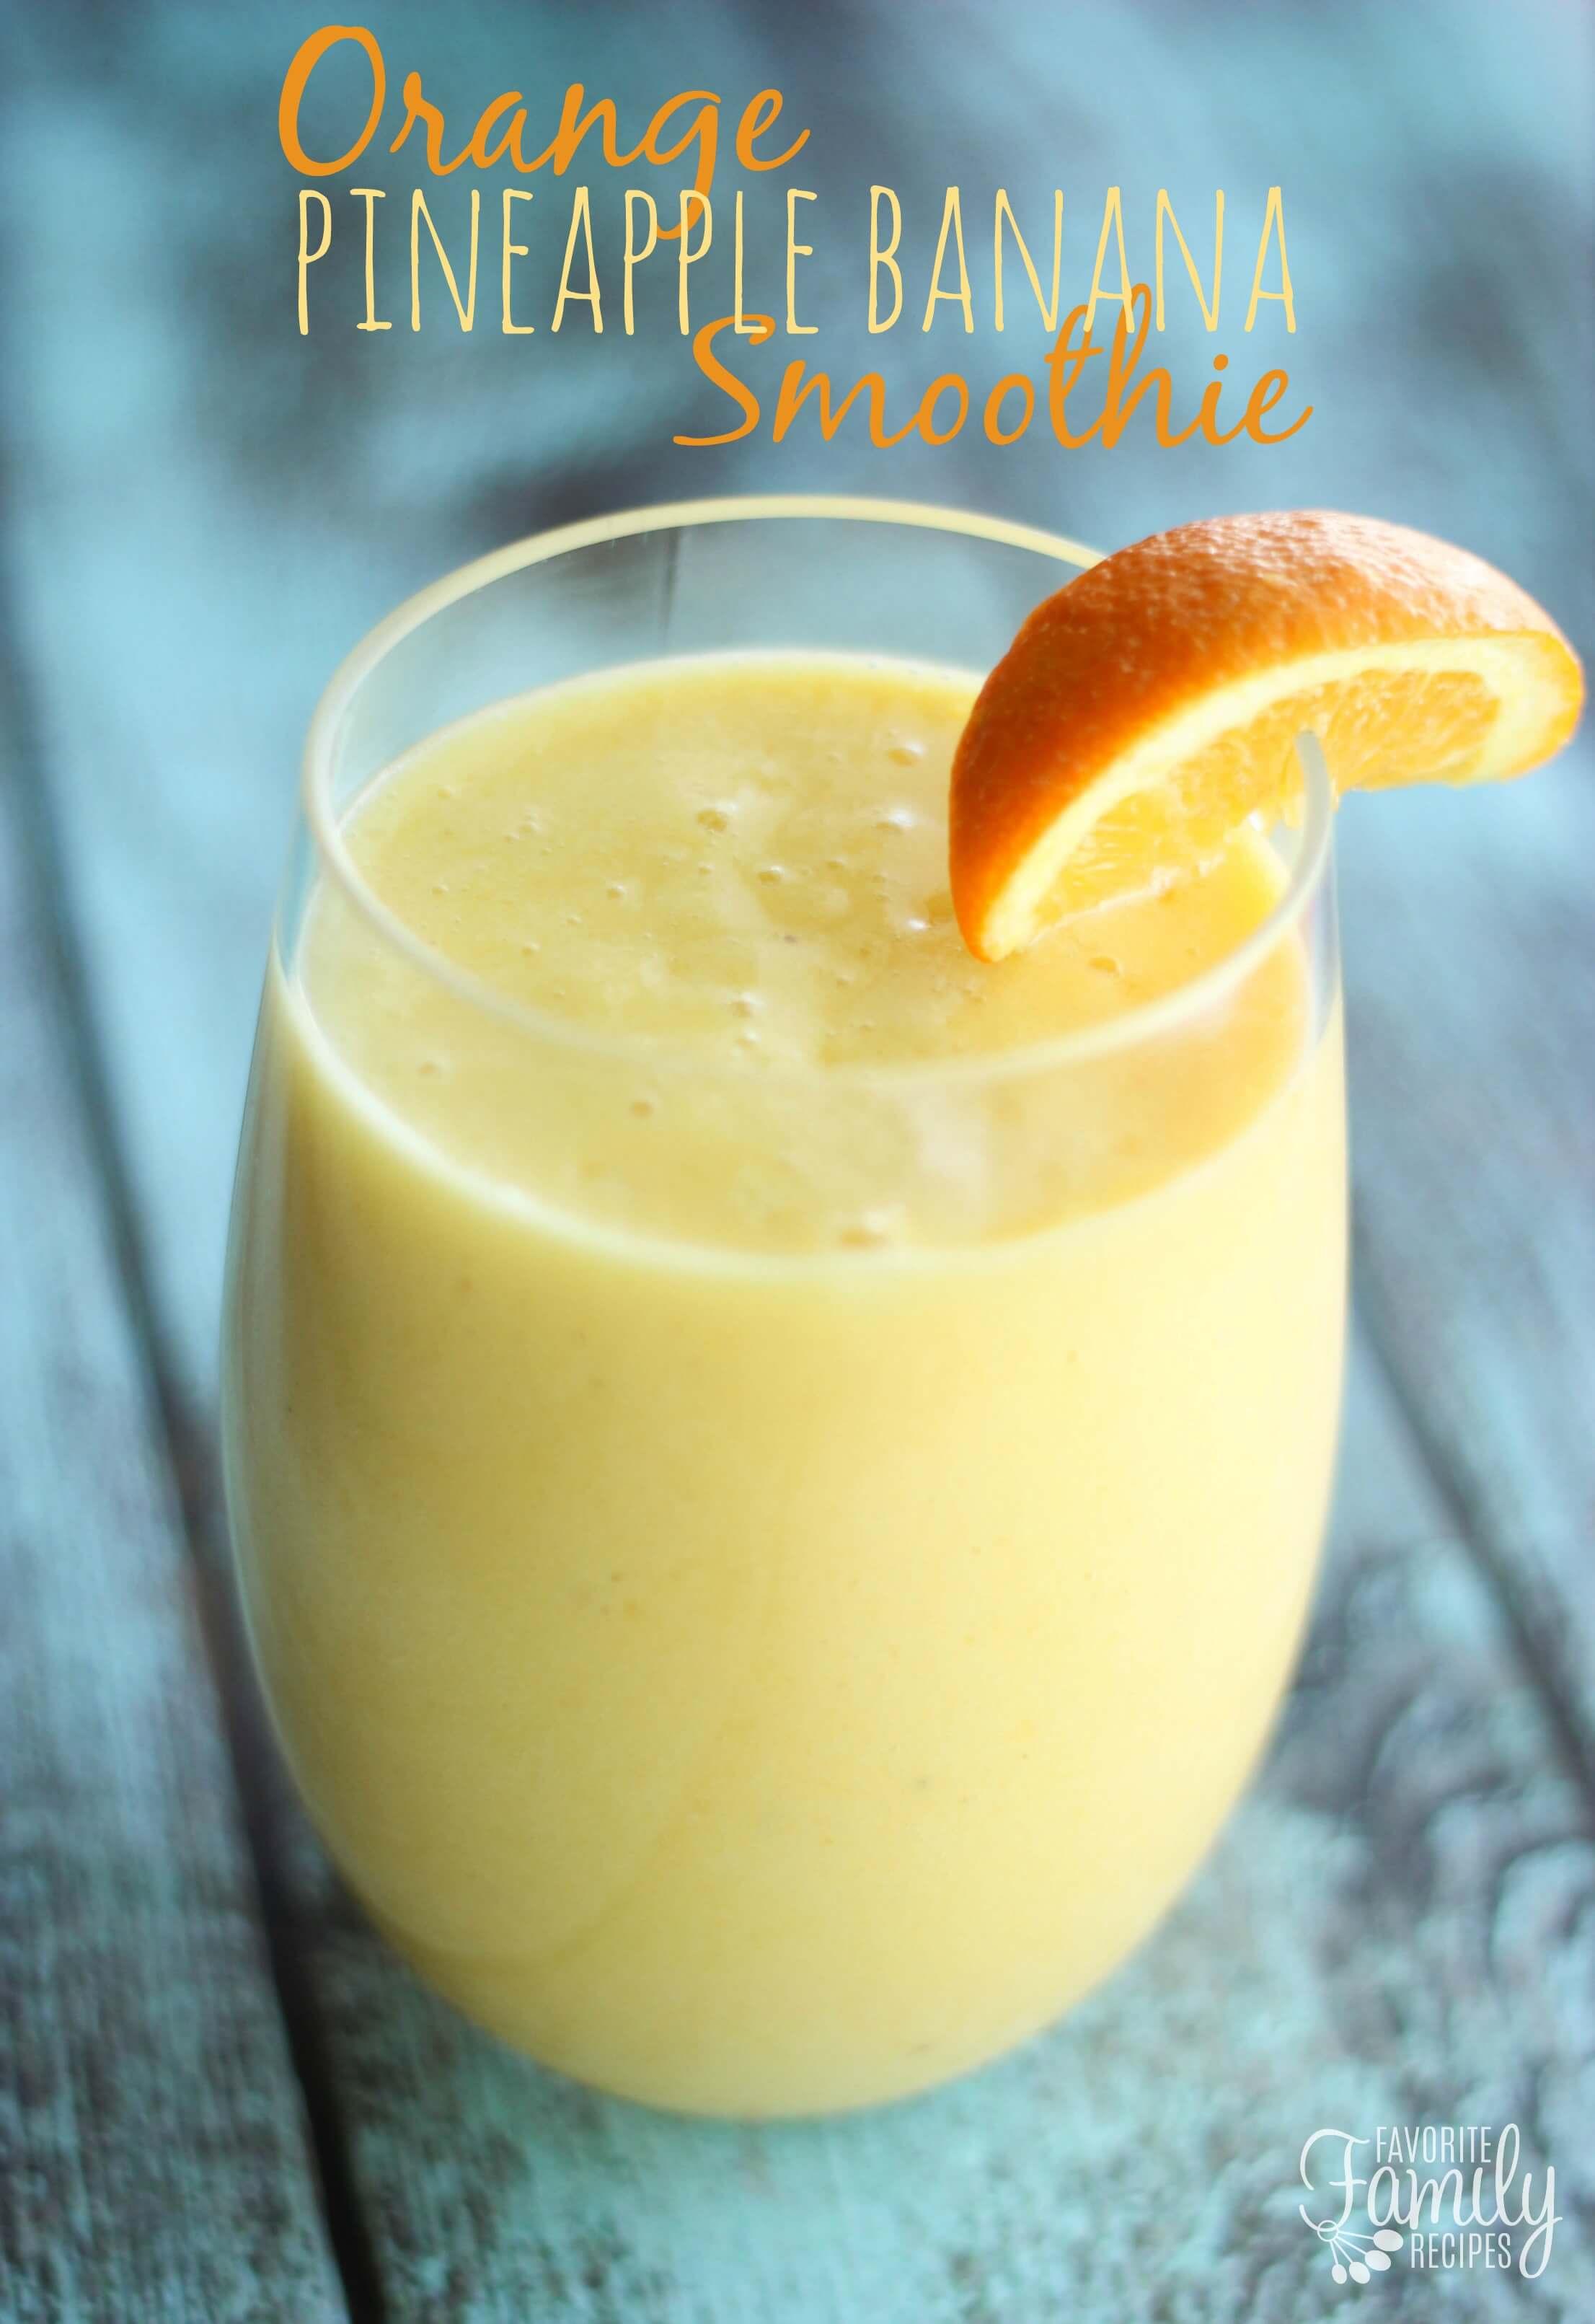 Orange Pineapple And Banana Smoothie Recipe Dishmaps